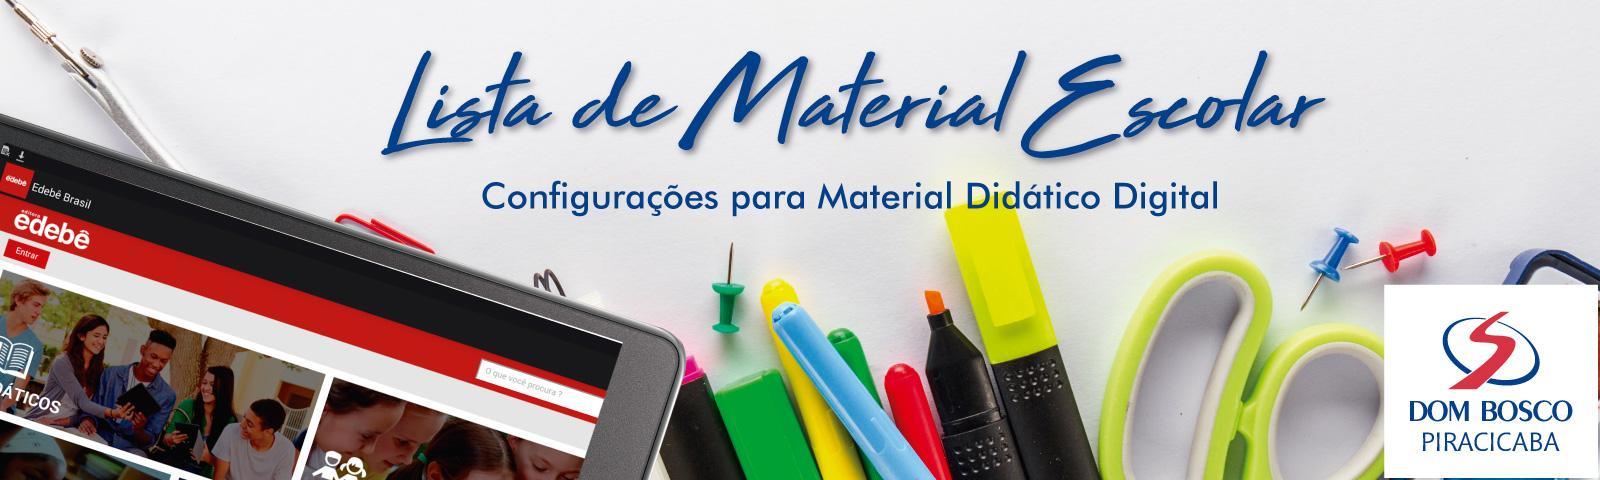 images/2017/10/76-fullhd-lista-de-material-escolar-1508174658.jpg